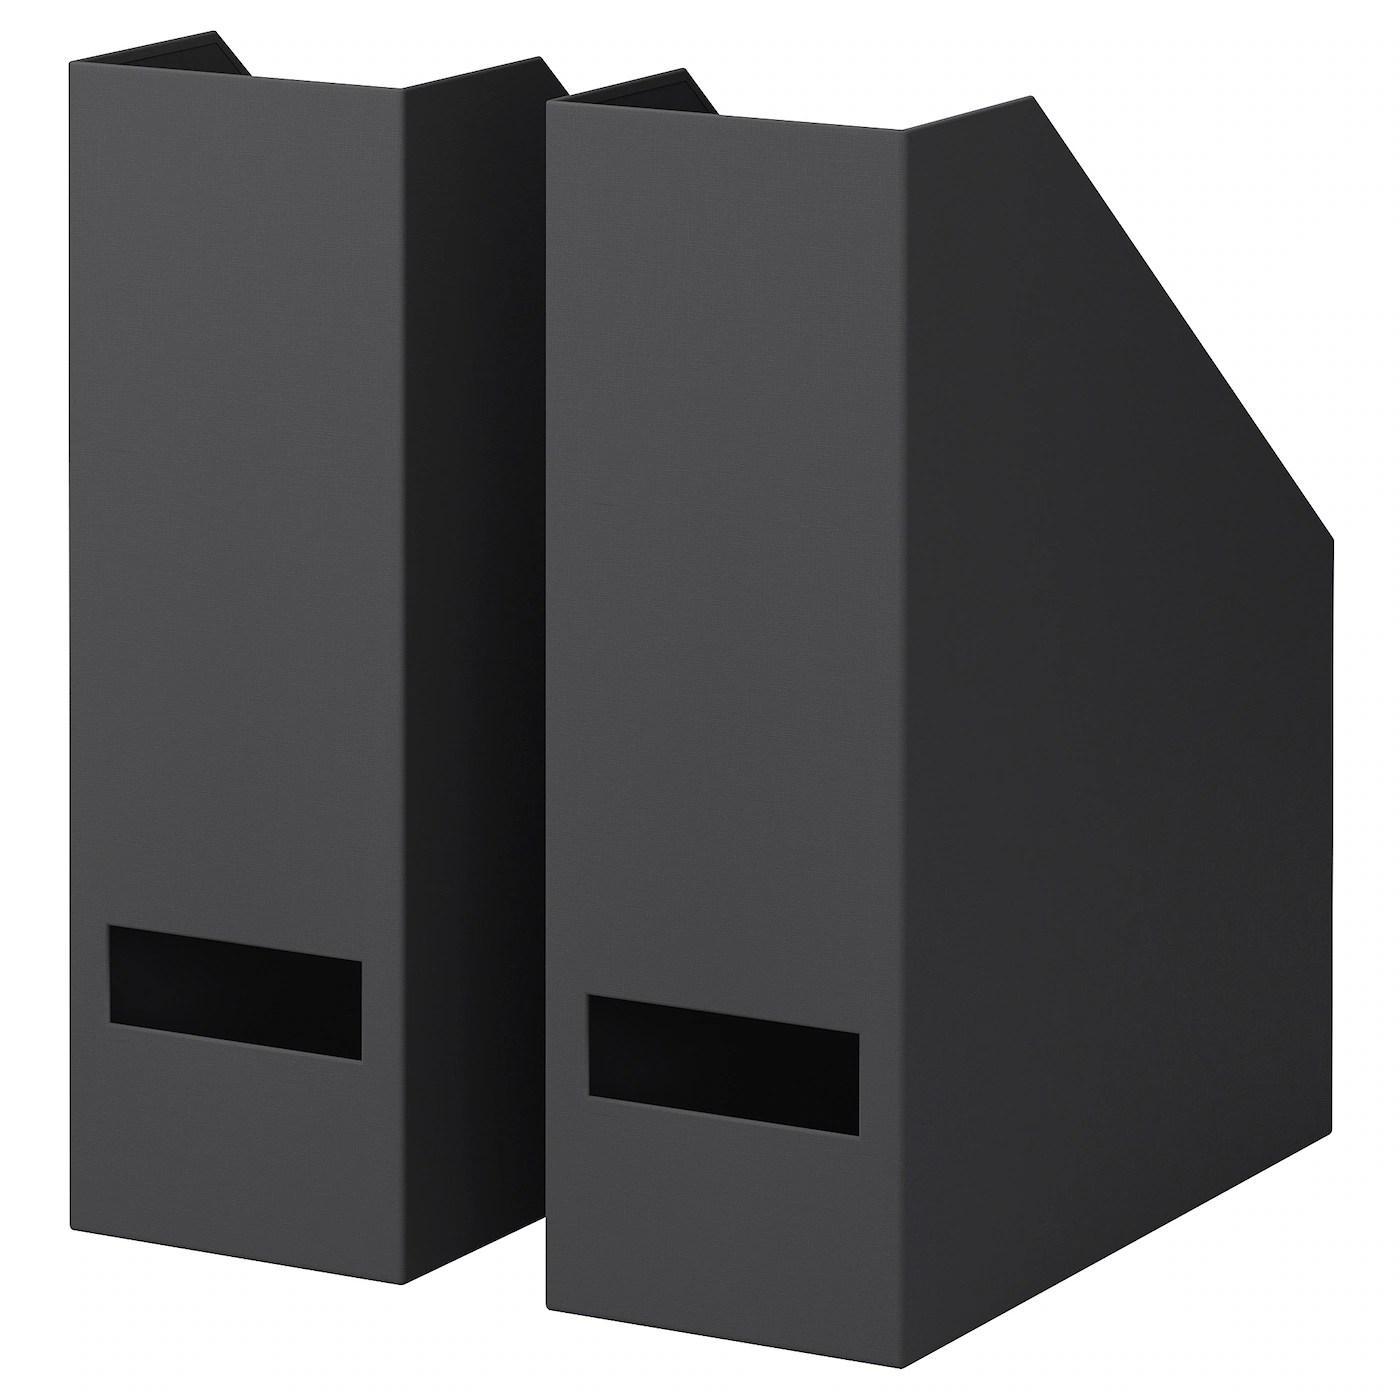 Tjena Range Revues Noir Materiau Durable Ikea